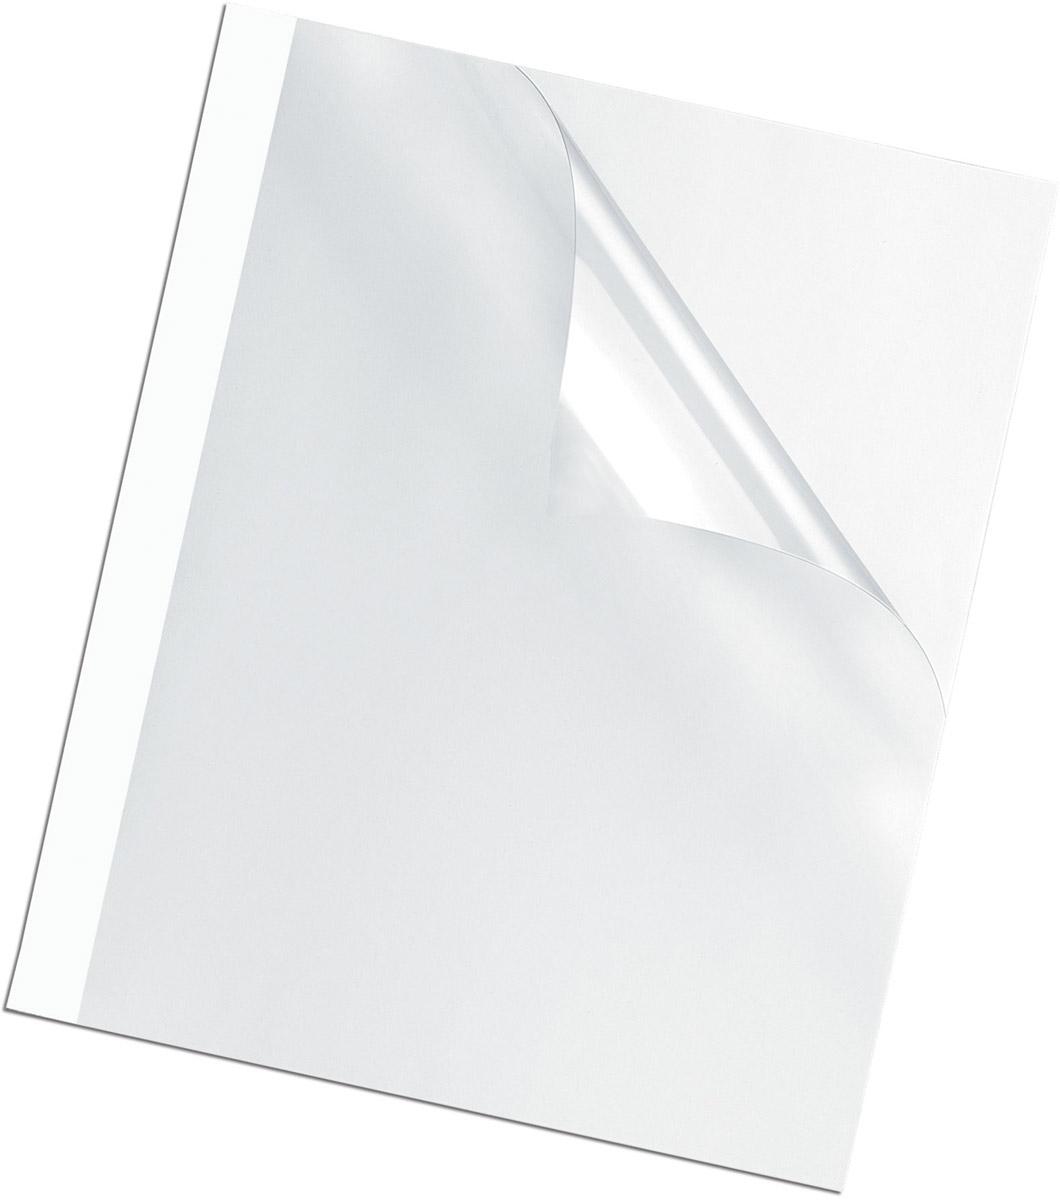 Fellowes A4 FS-53914 обложка для термопереплета, 10 мм (100 шт) обложка для термопереплета fellowes fs 53153